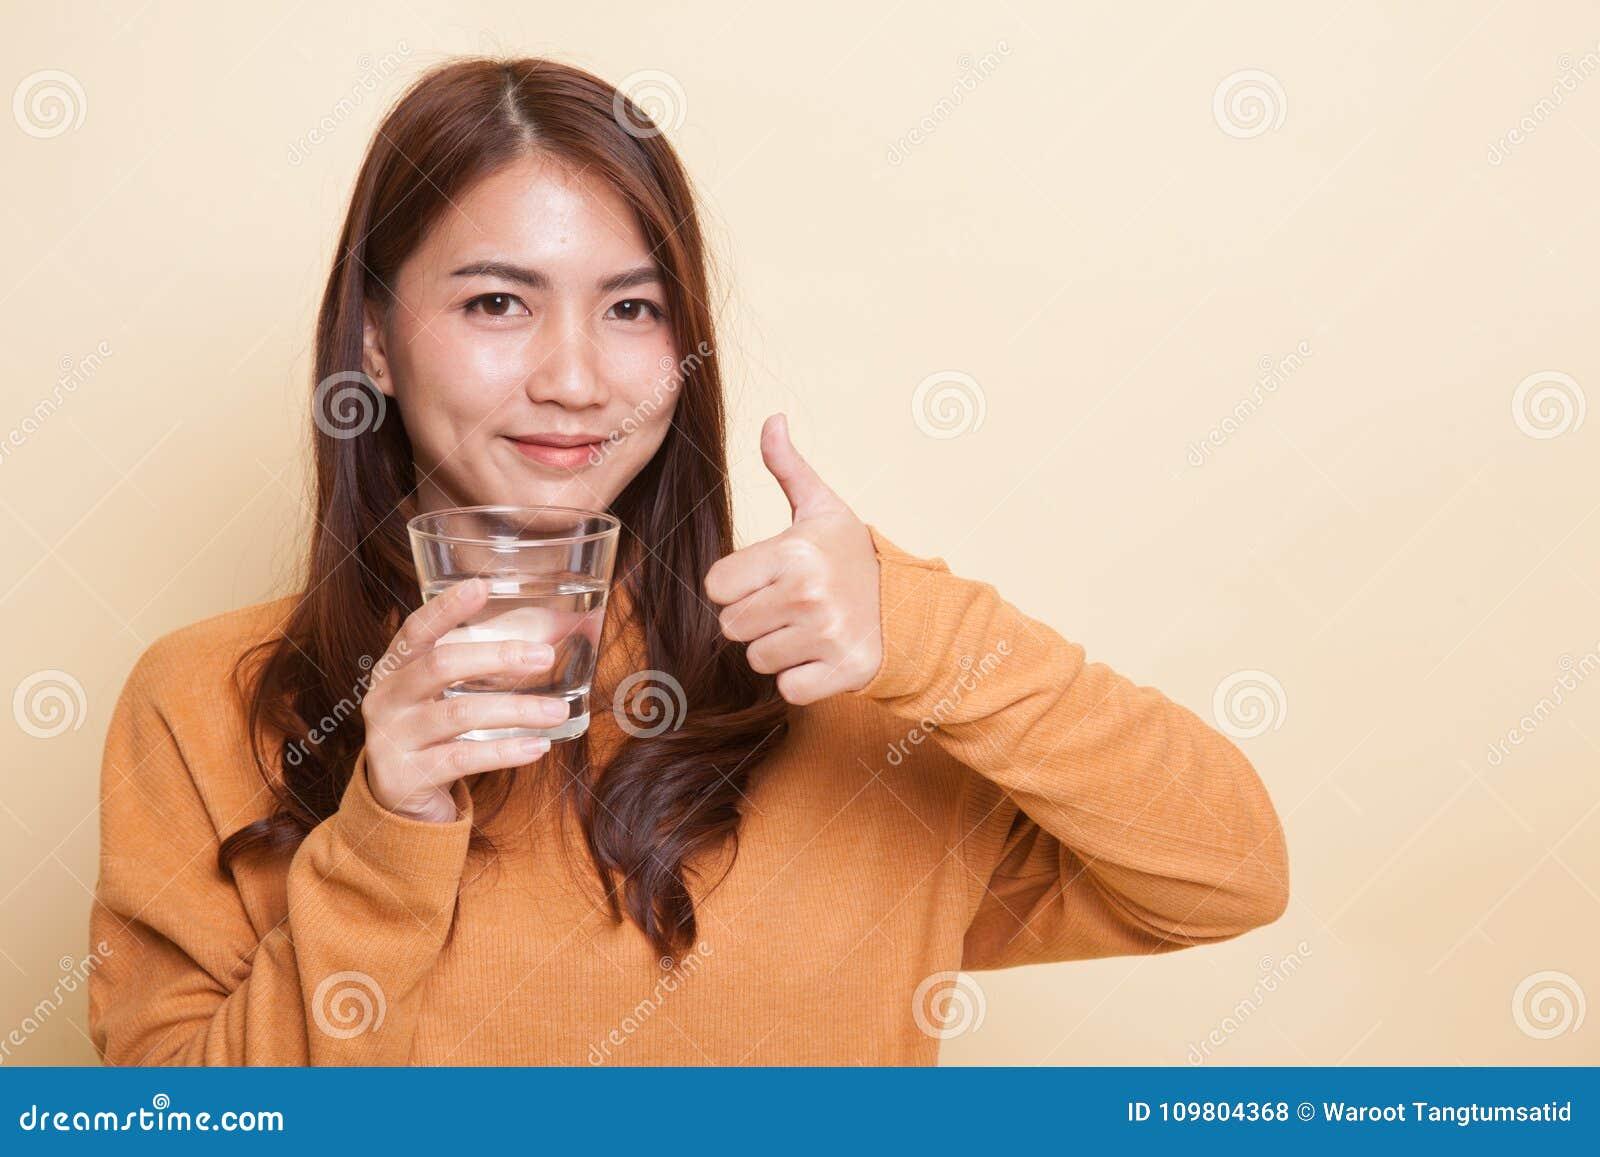 women thumbs Asian